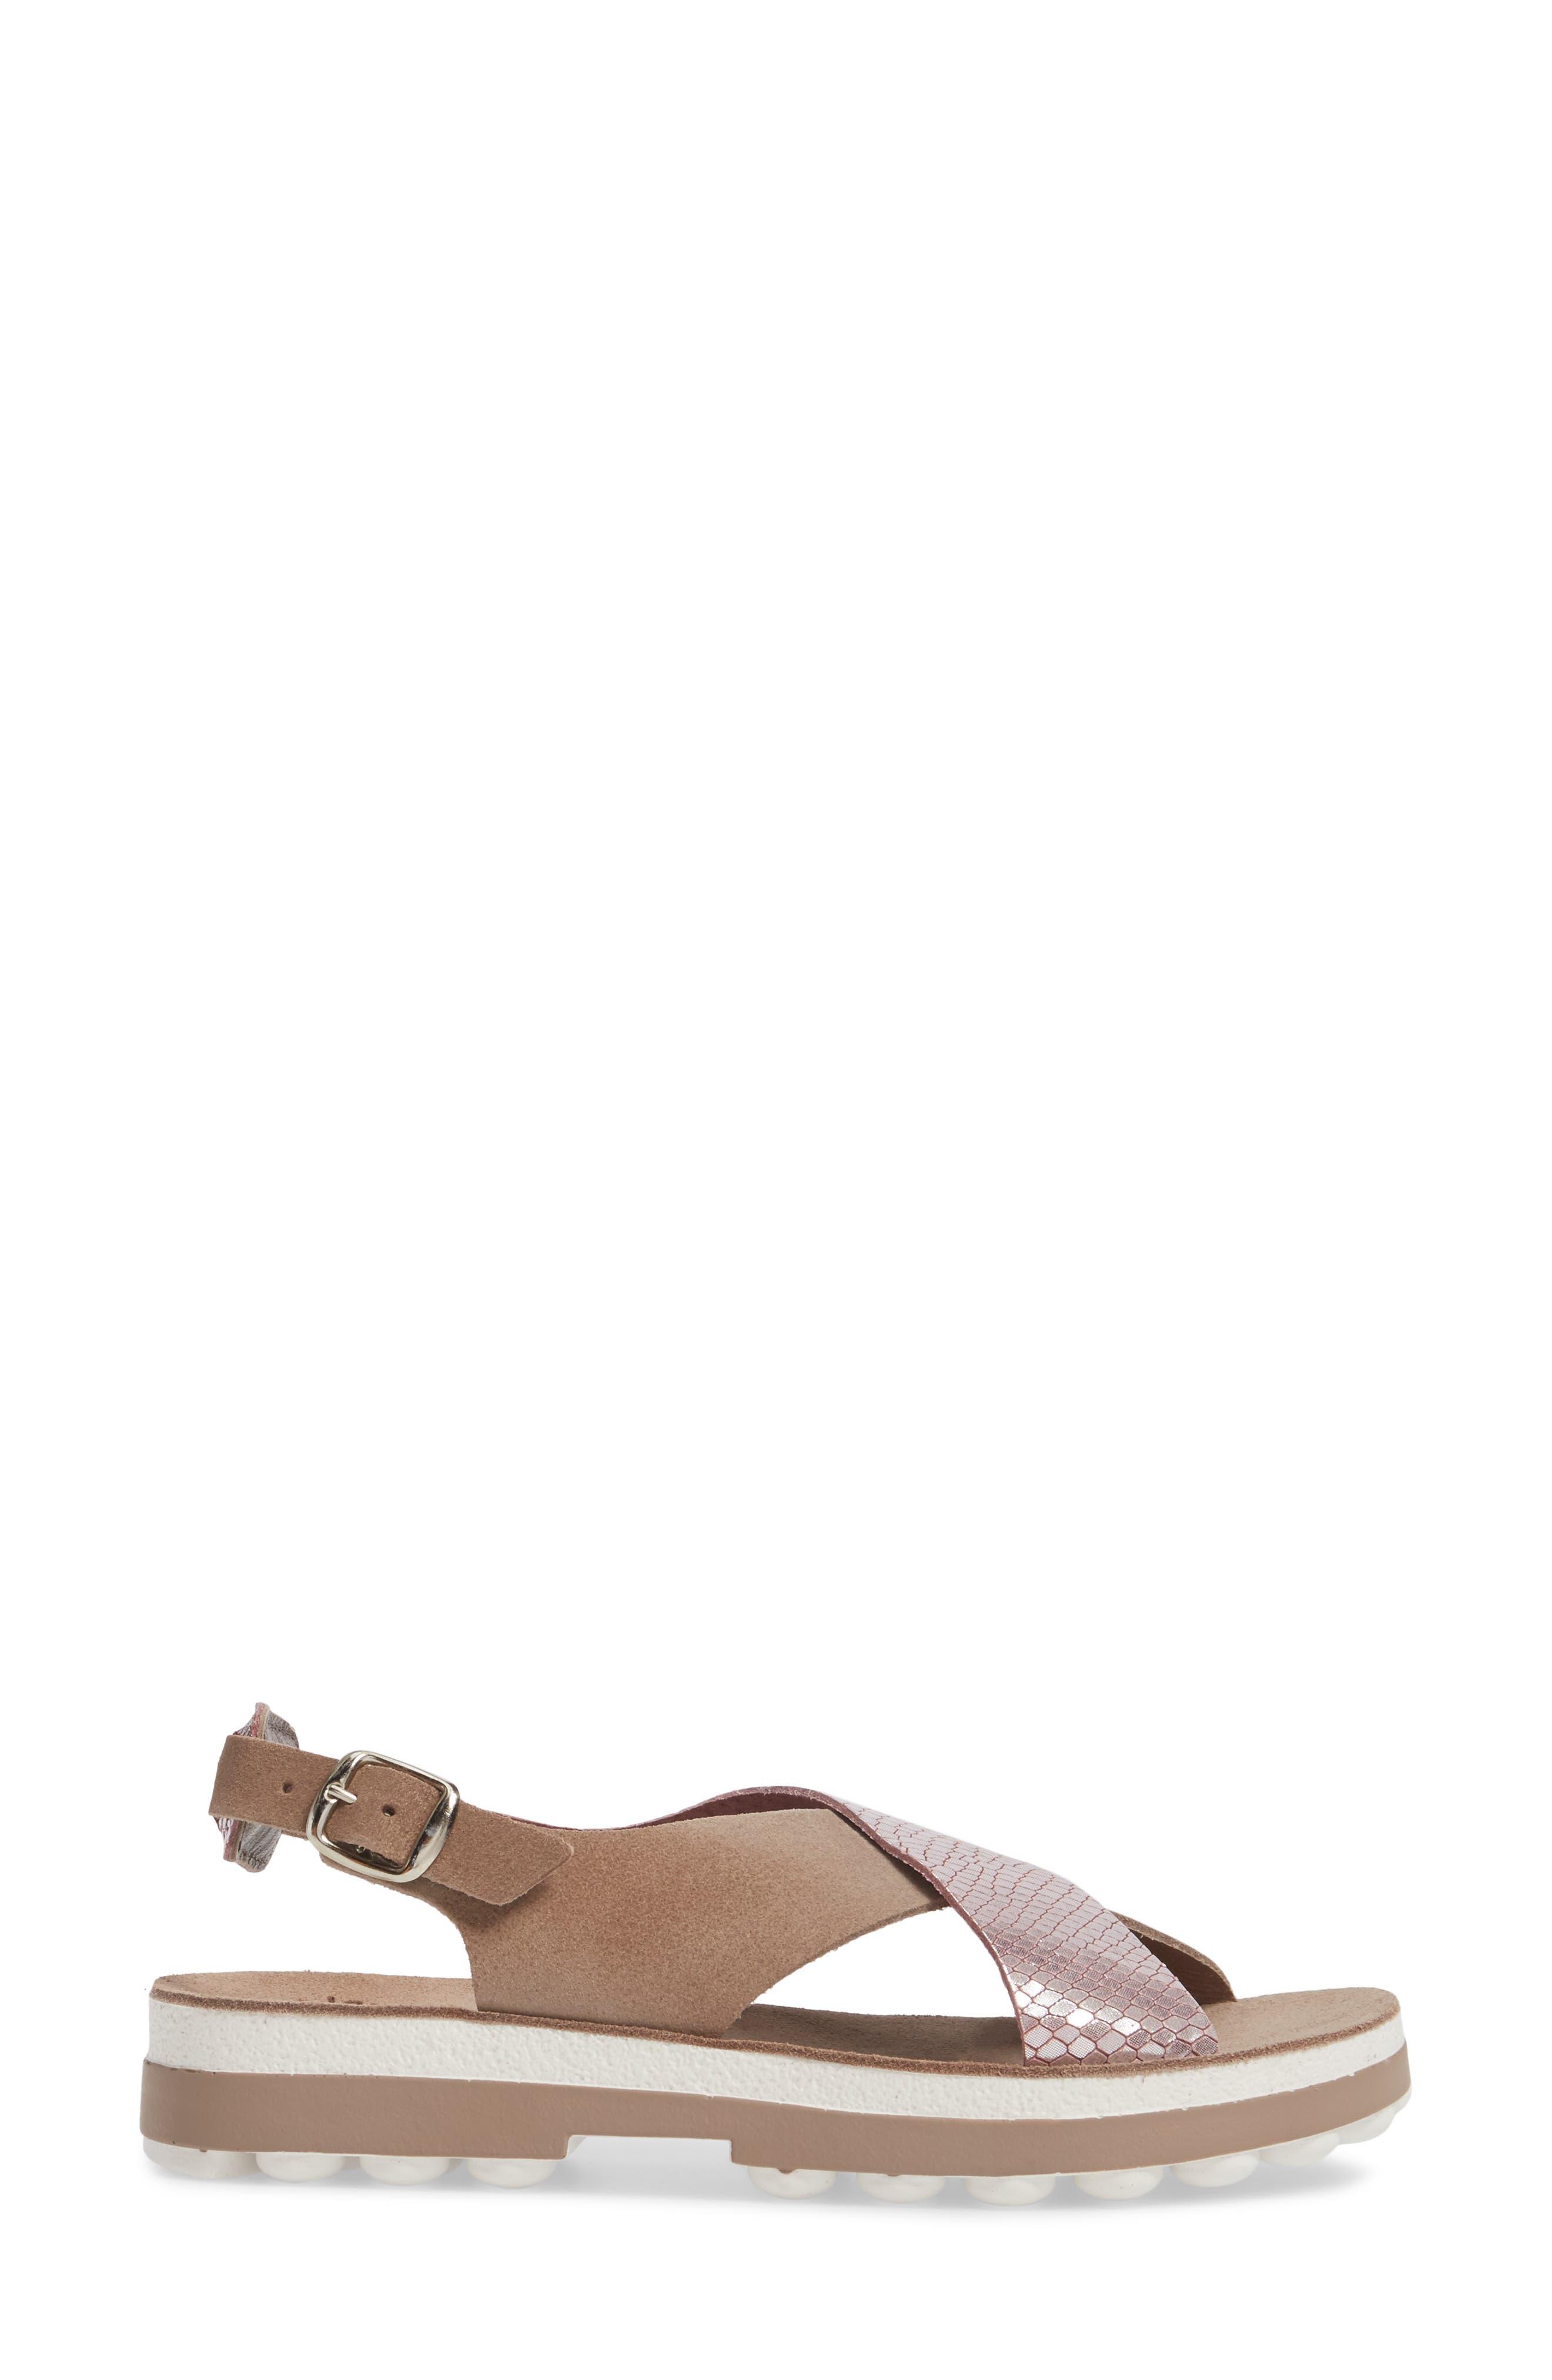 Izabella Fantasy Platform Sandal,                             Alternate thumbnail 3, color,                             Coffee Snake Leather